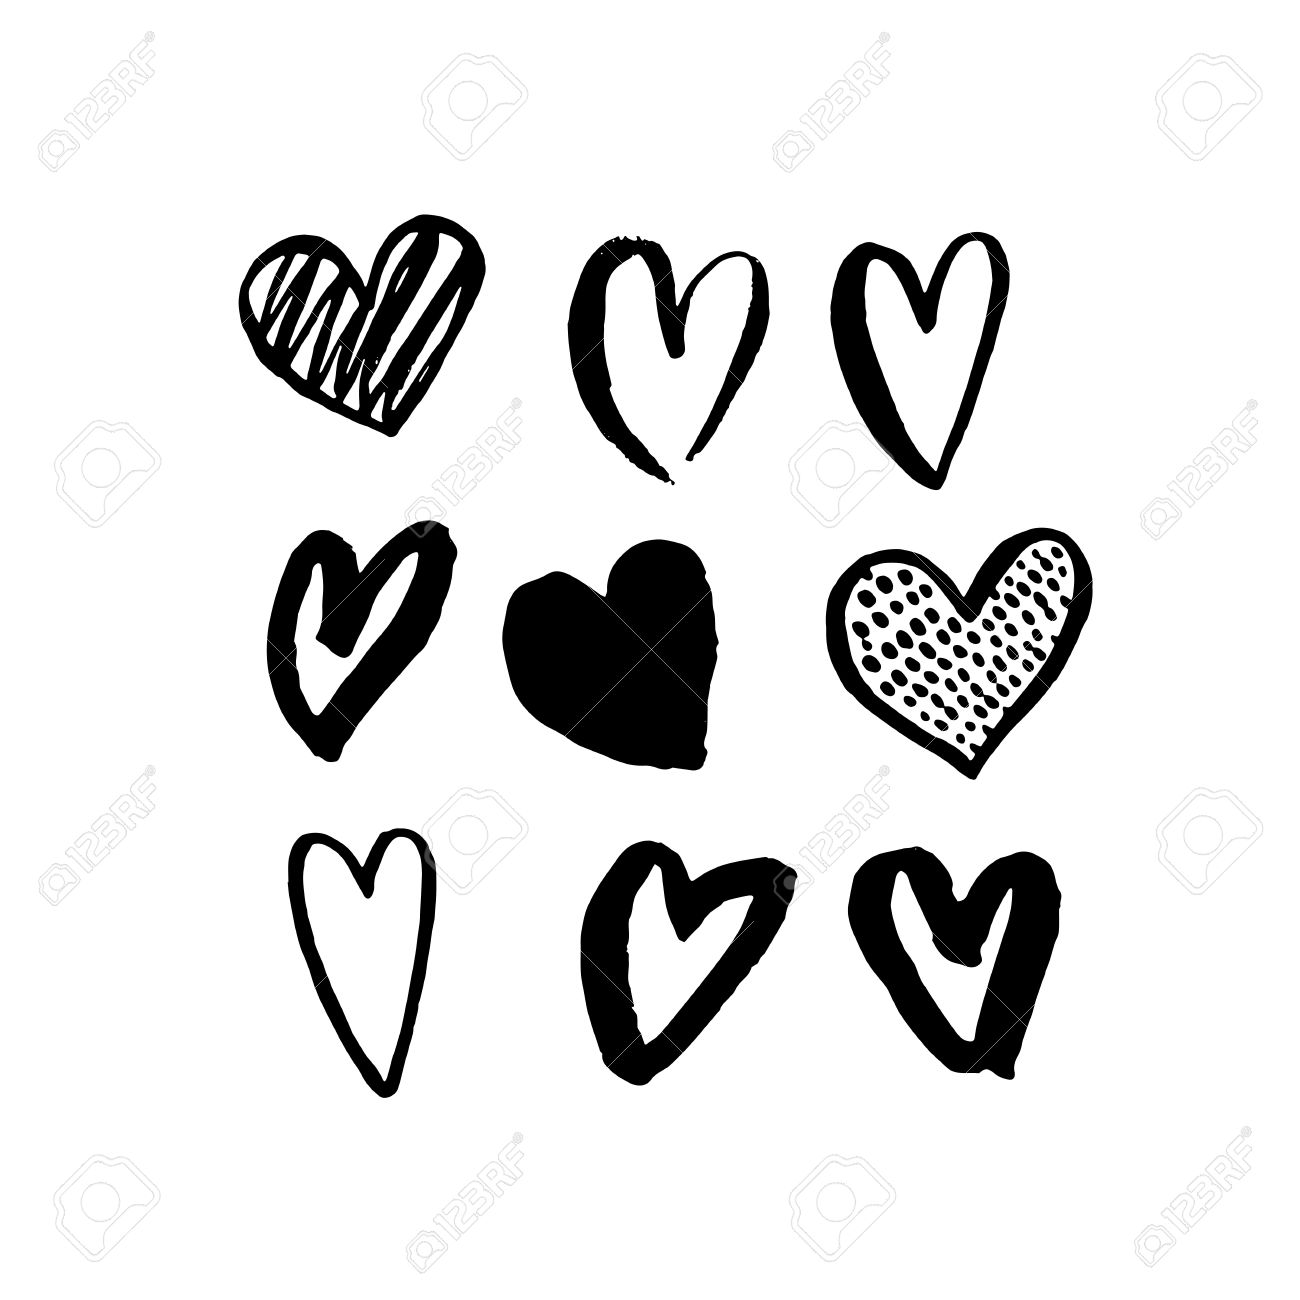 vector heart icons hand drawn art design for saint valentine